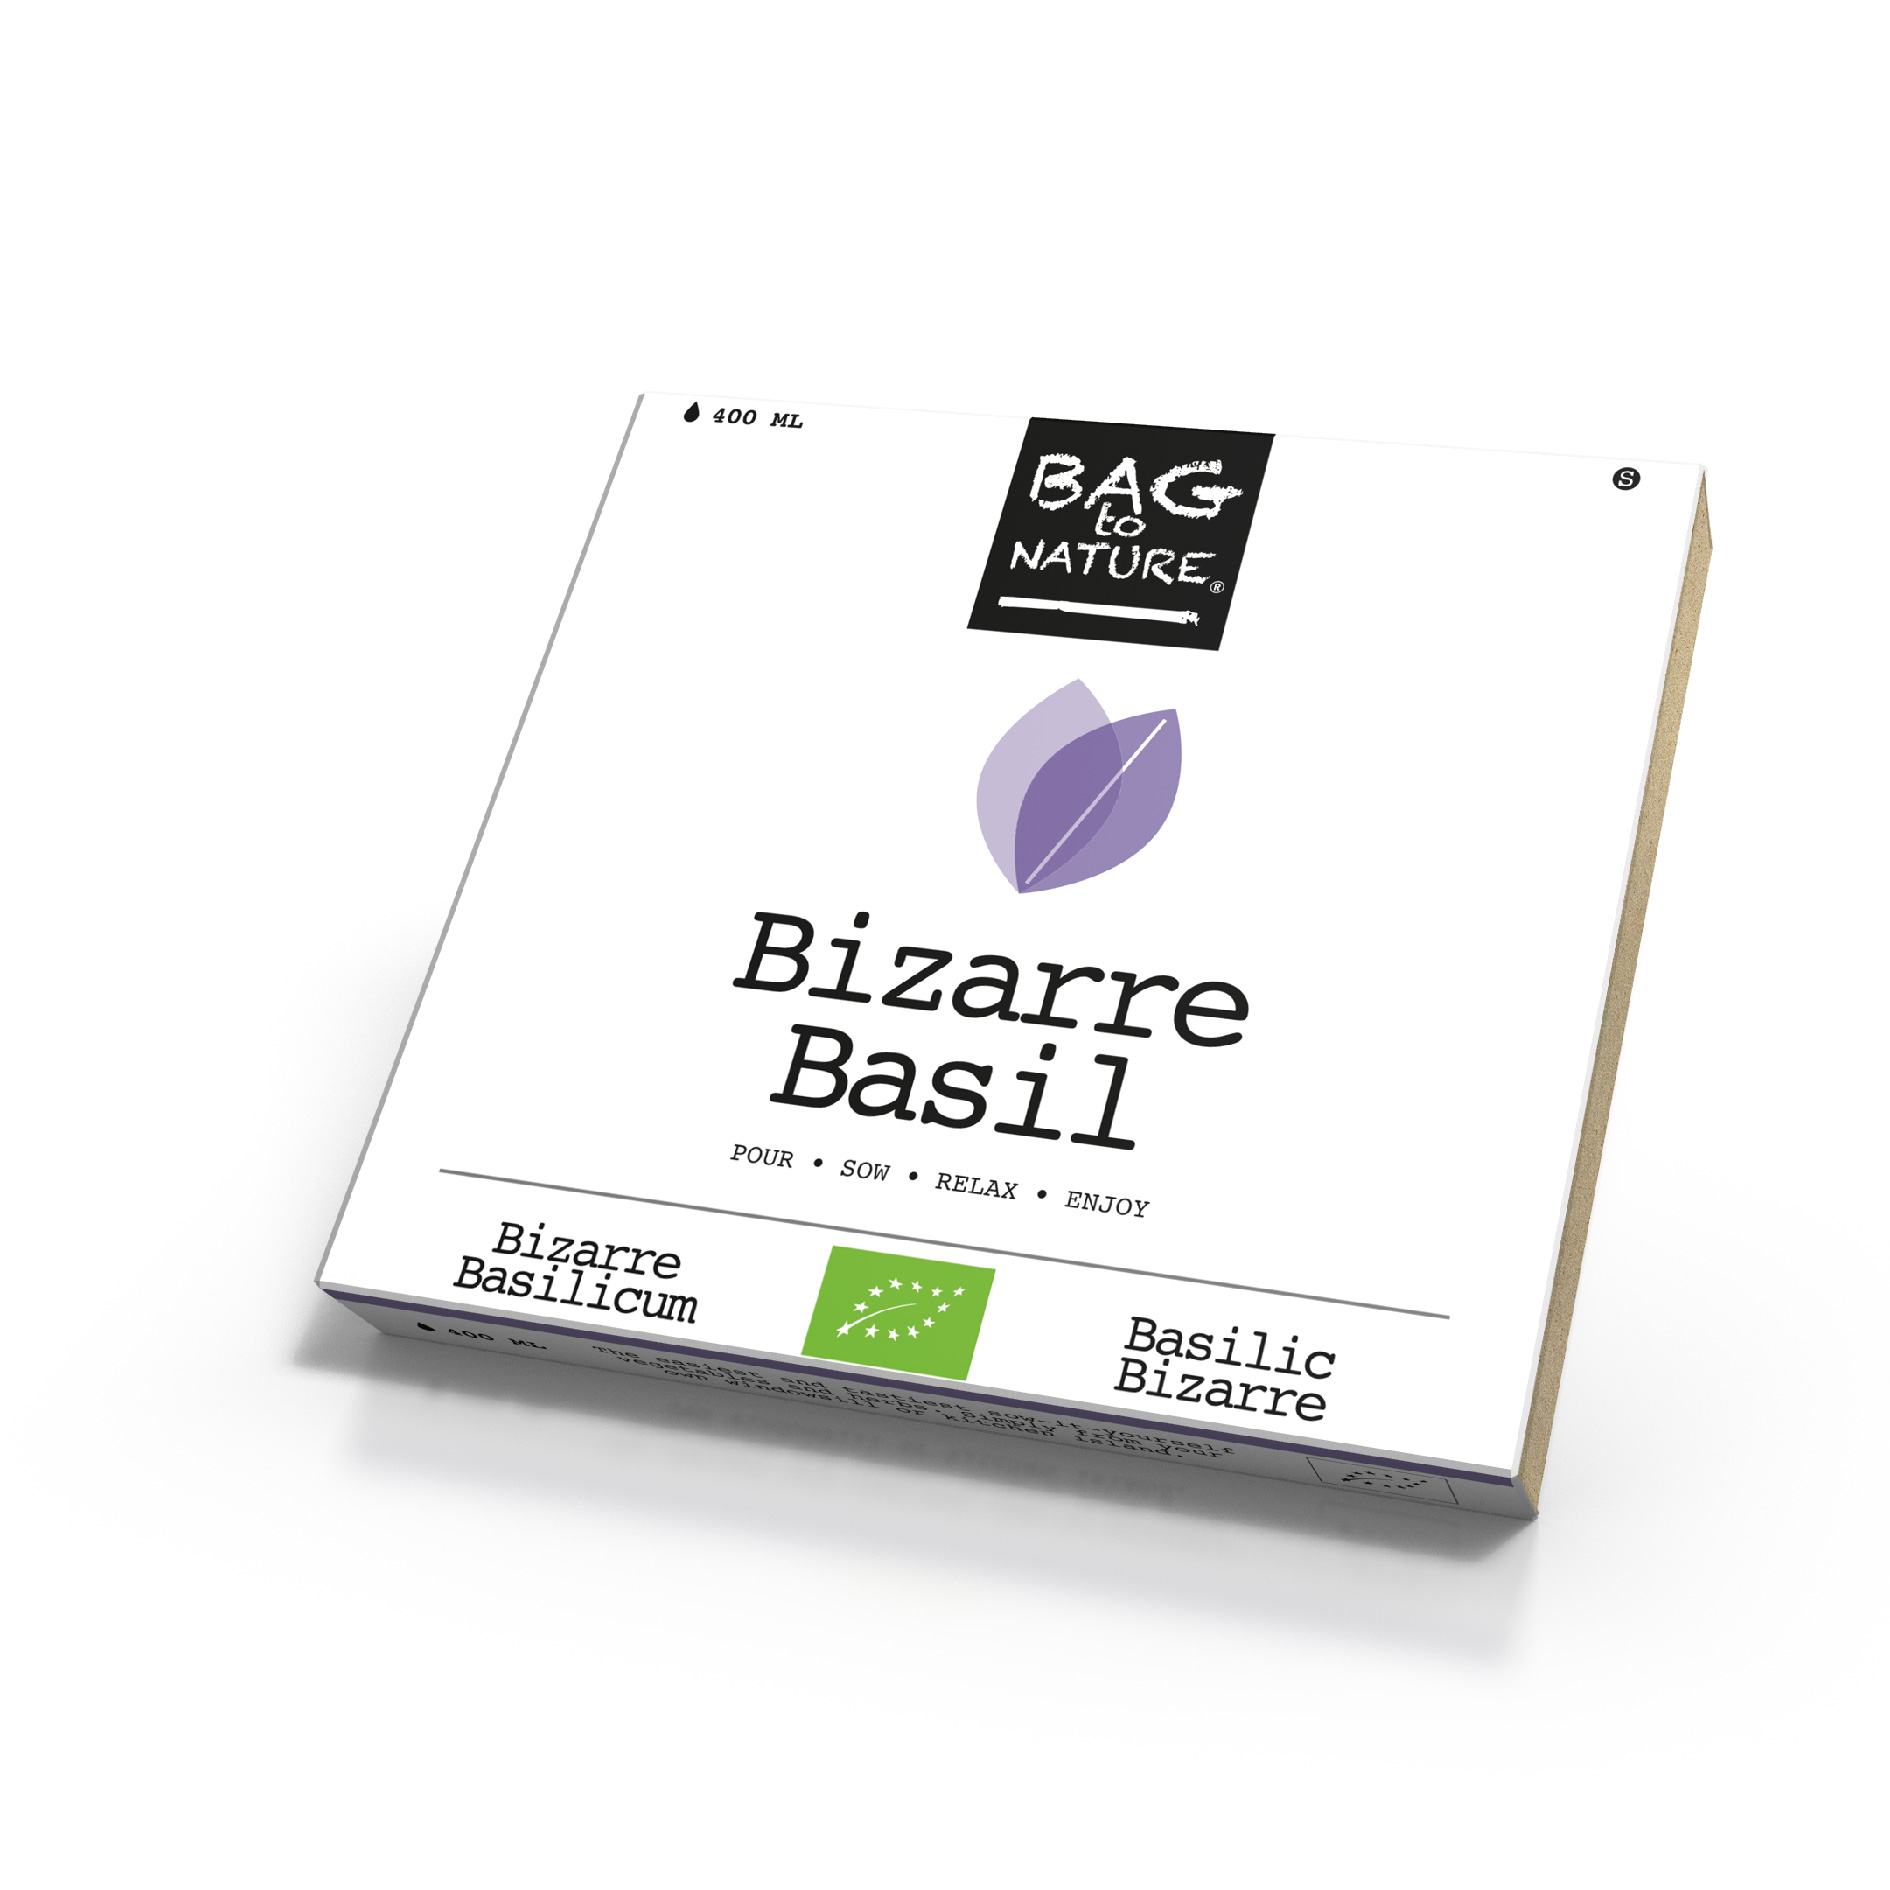 Bizarre Basil